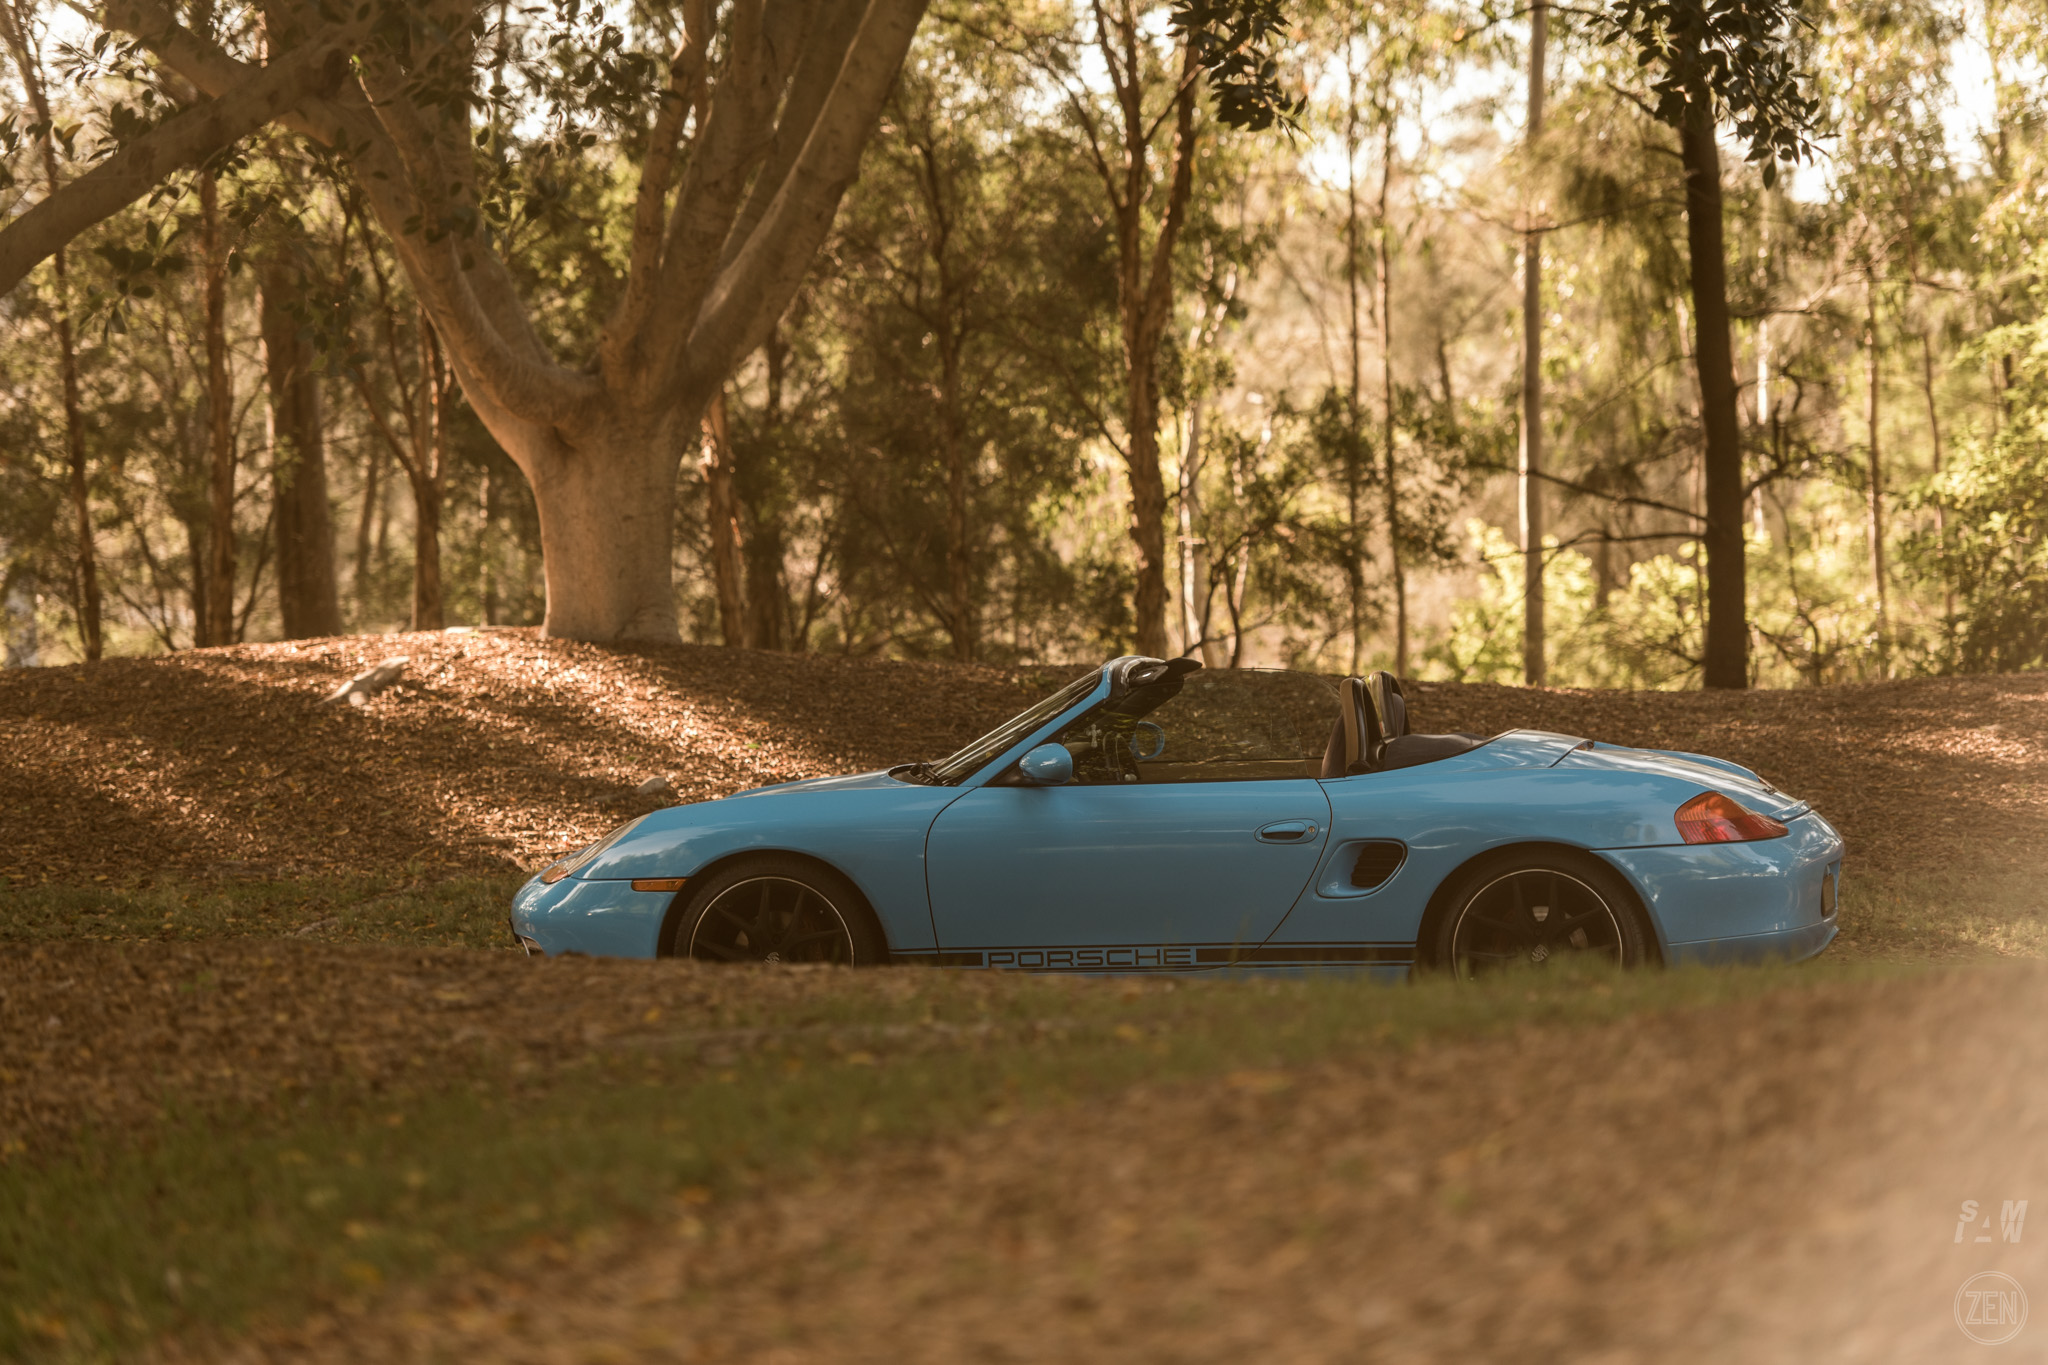 2019-10-27 - Autohaus Porsches & Coffee 113